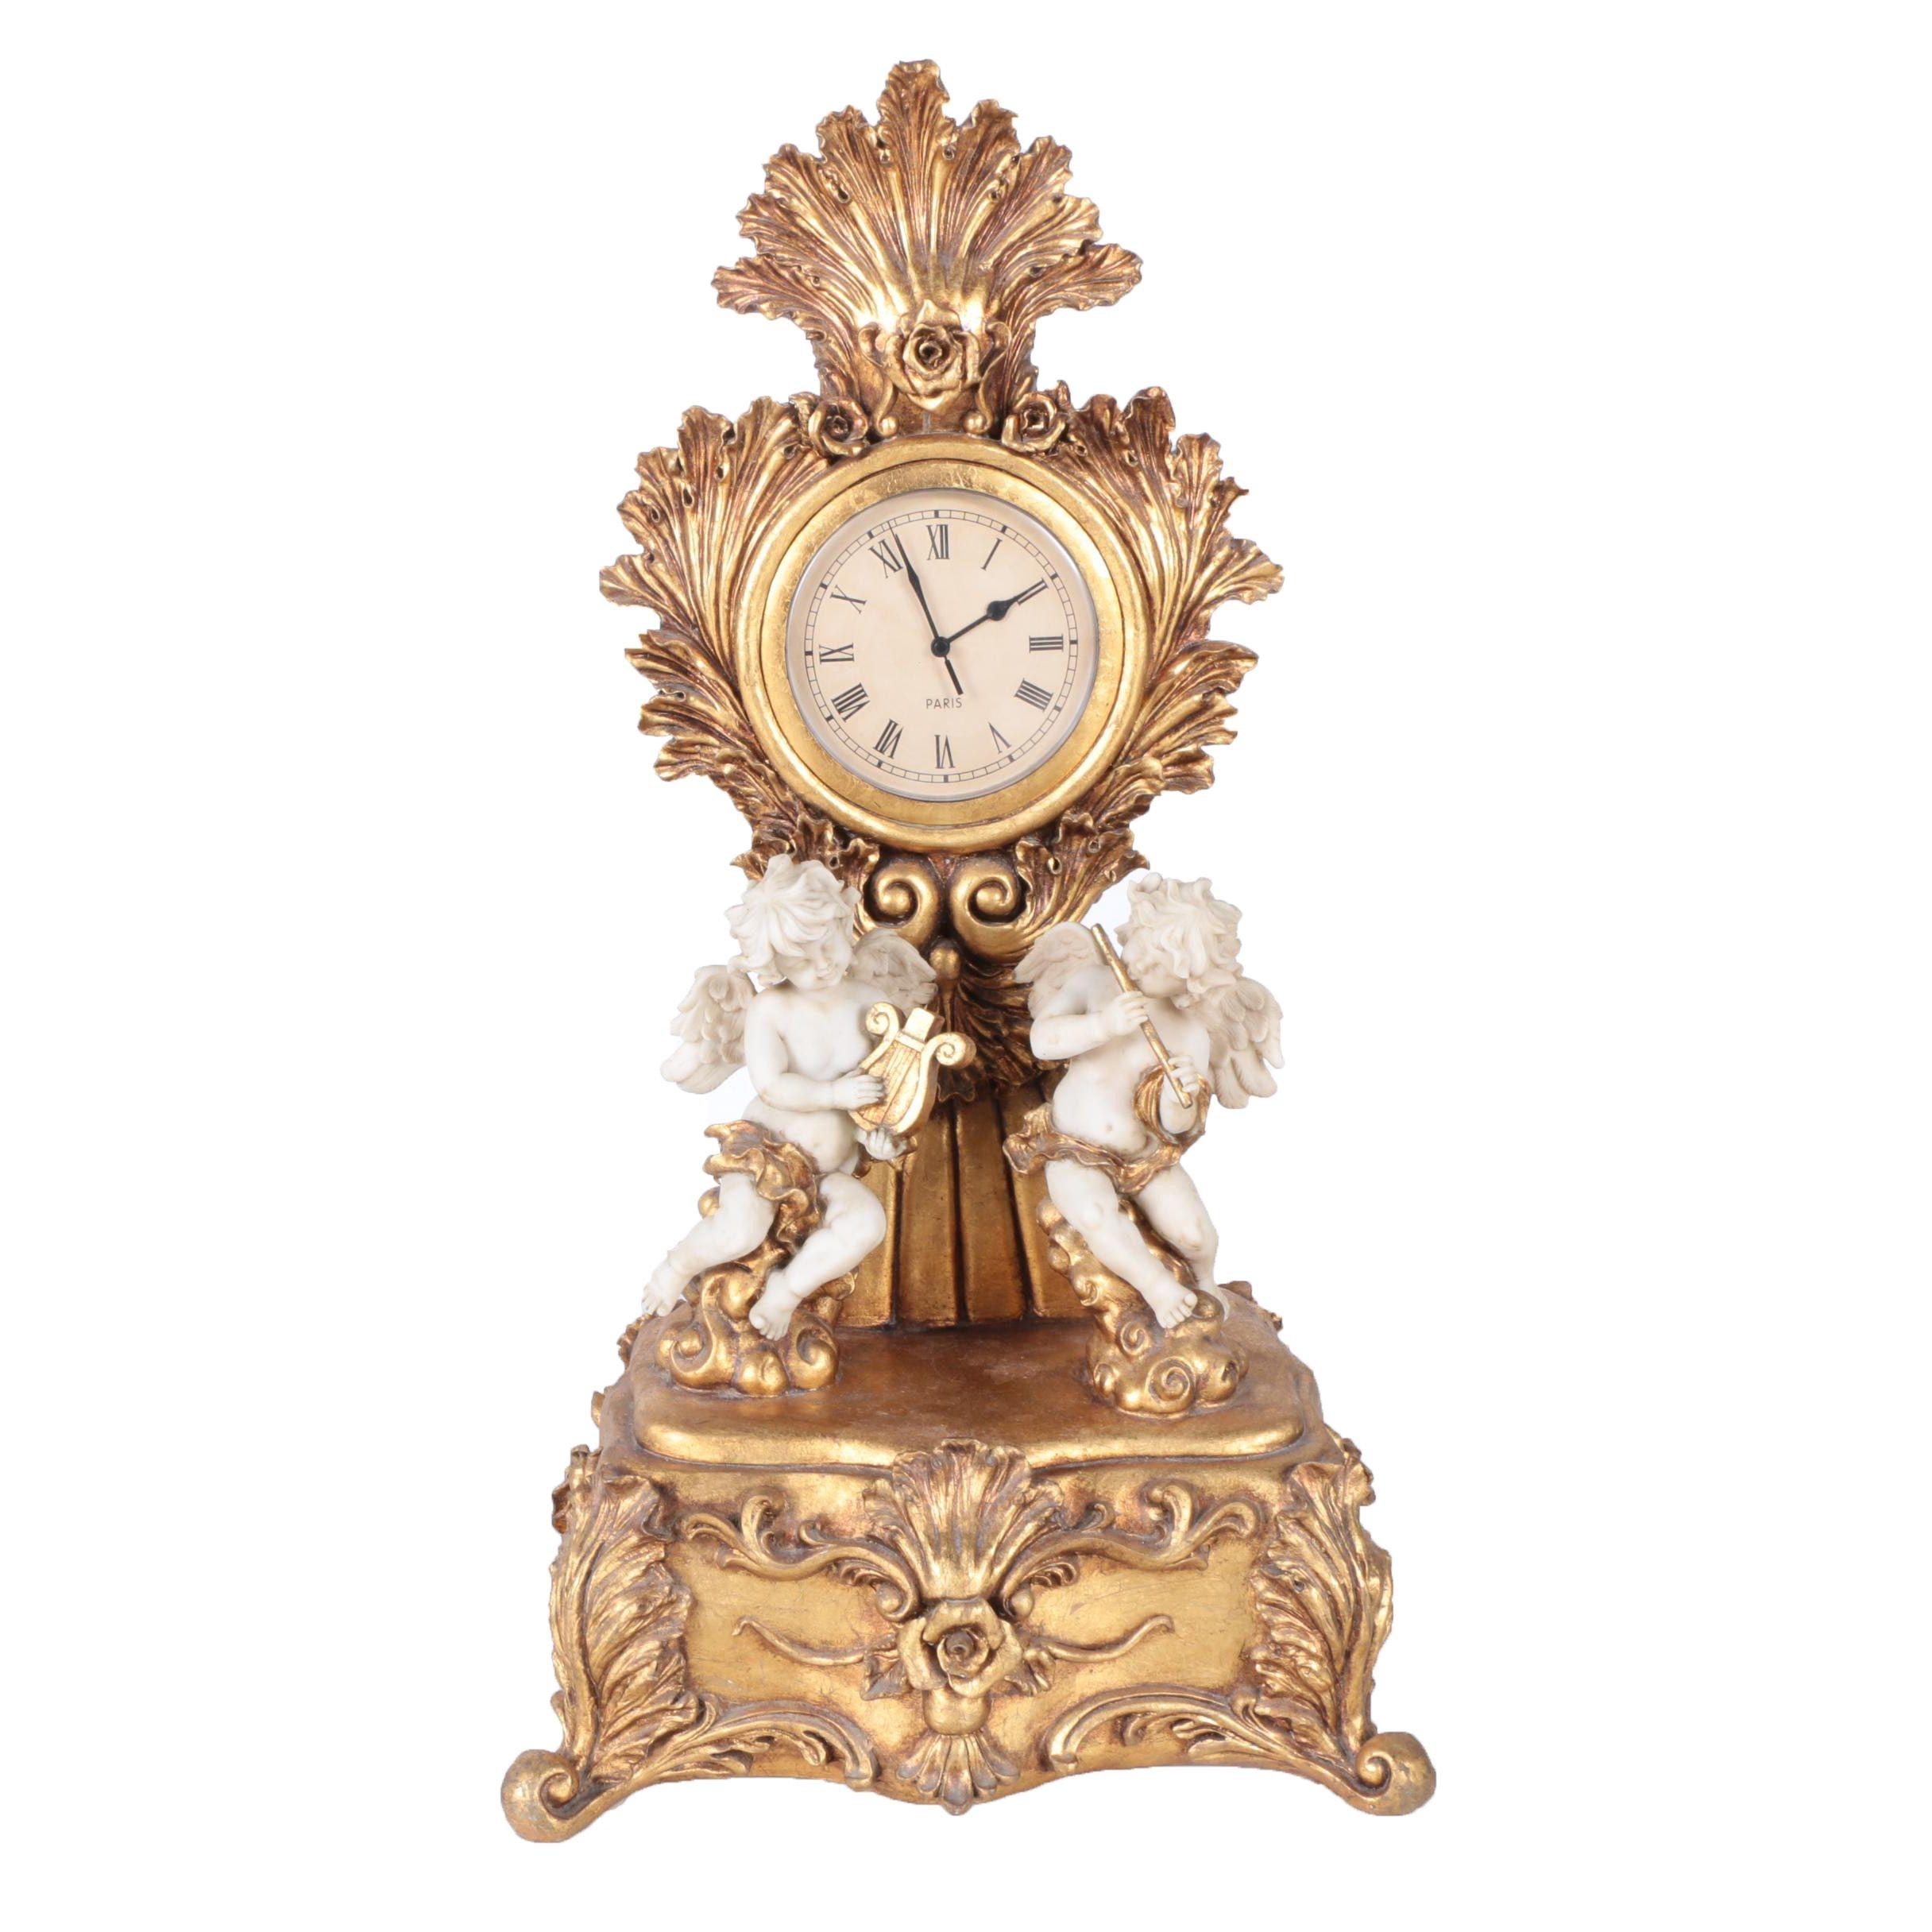 Rococo Style Mantel Clock